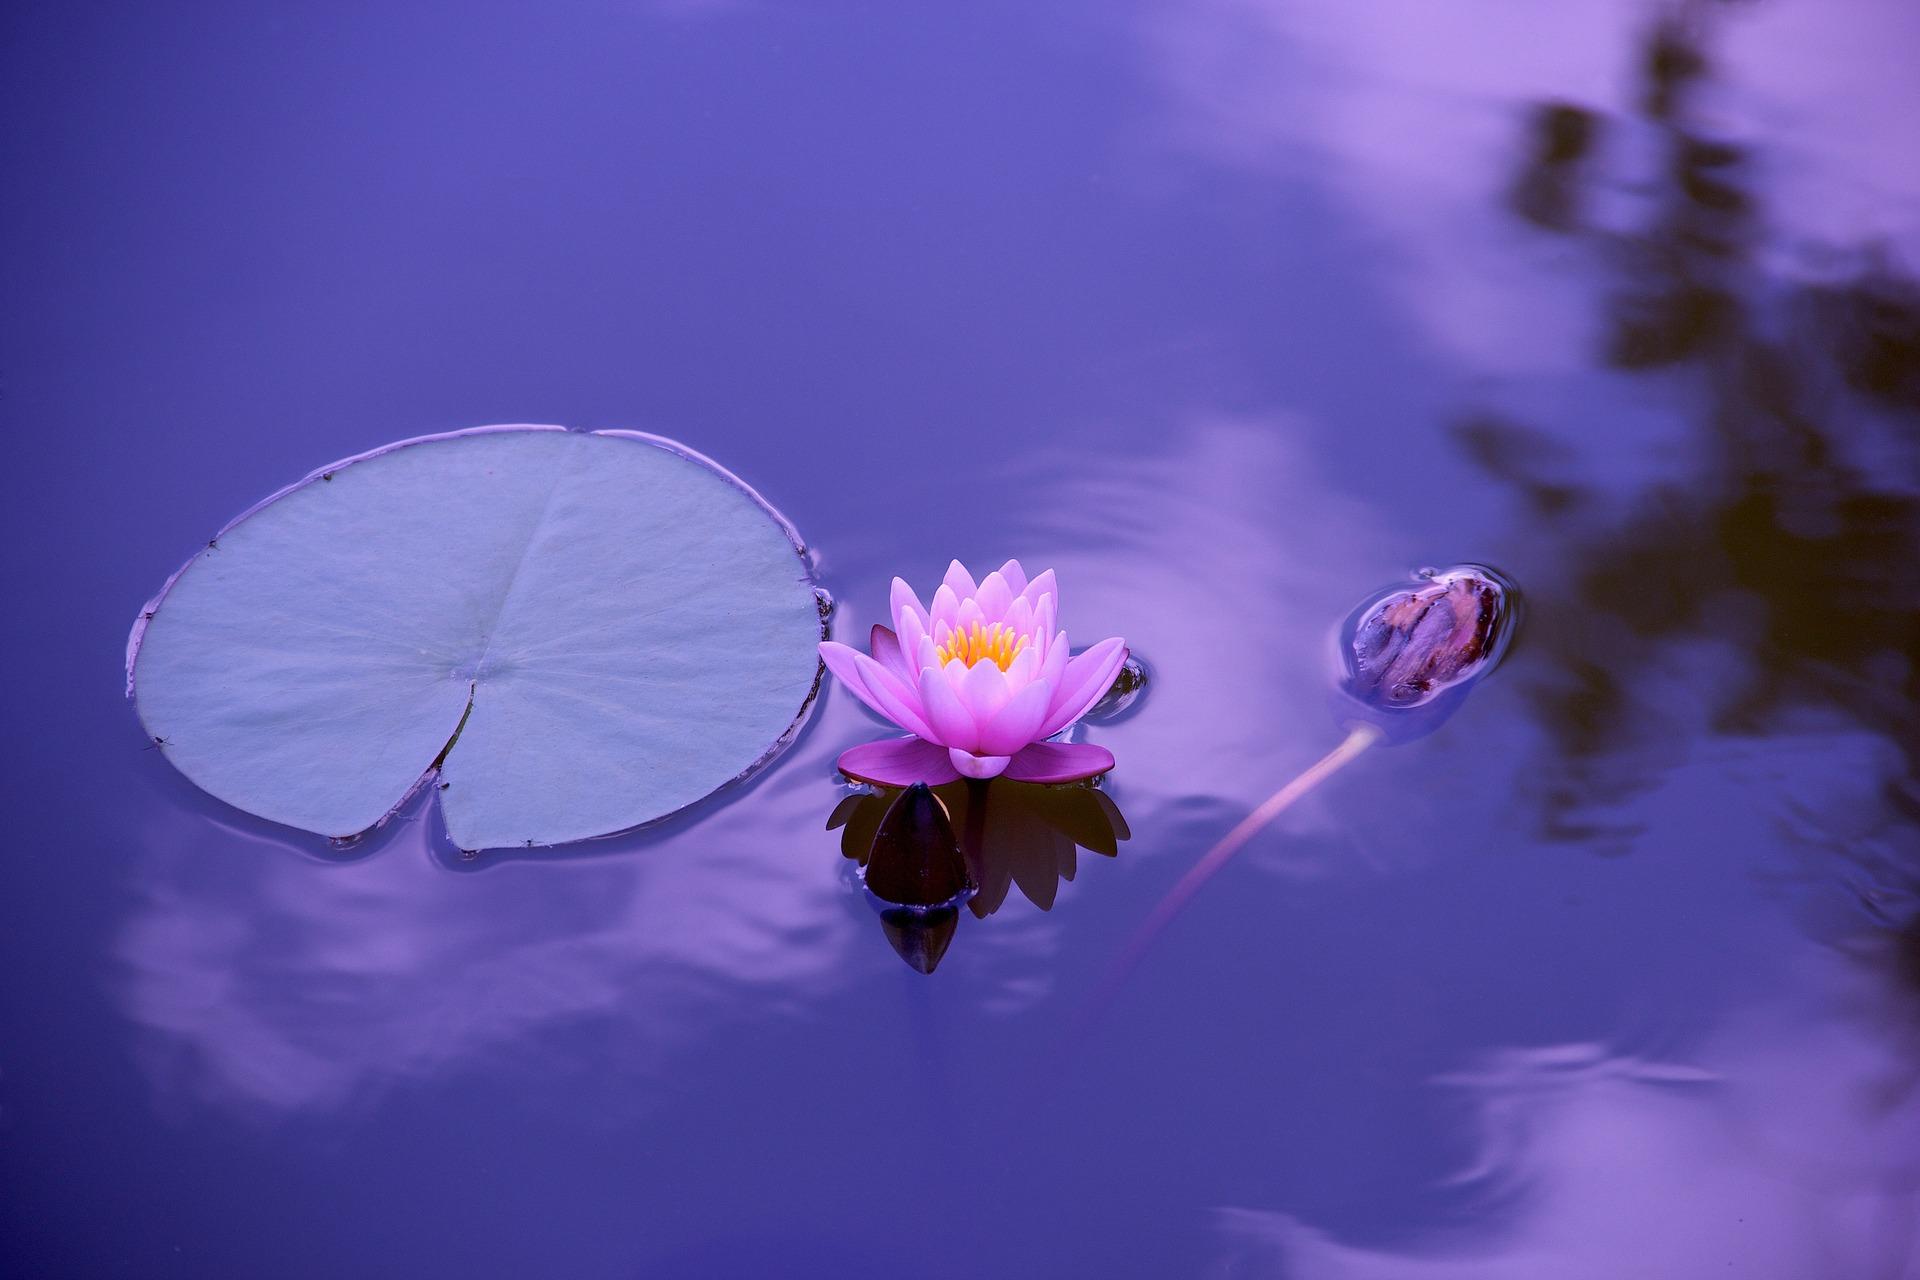 Релаксация и медитация